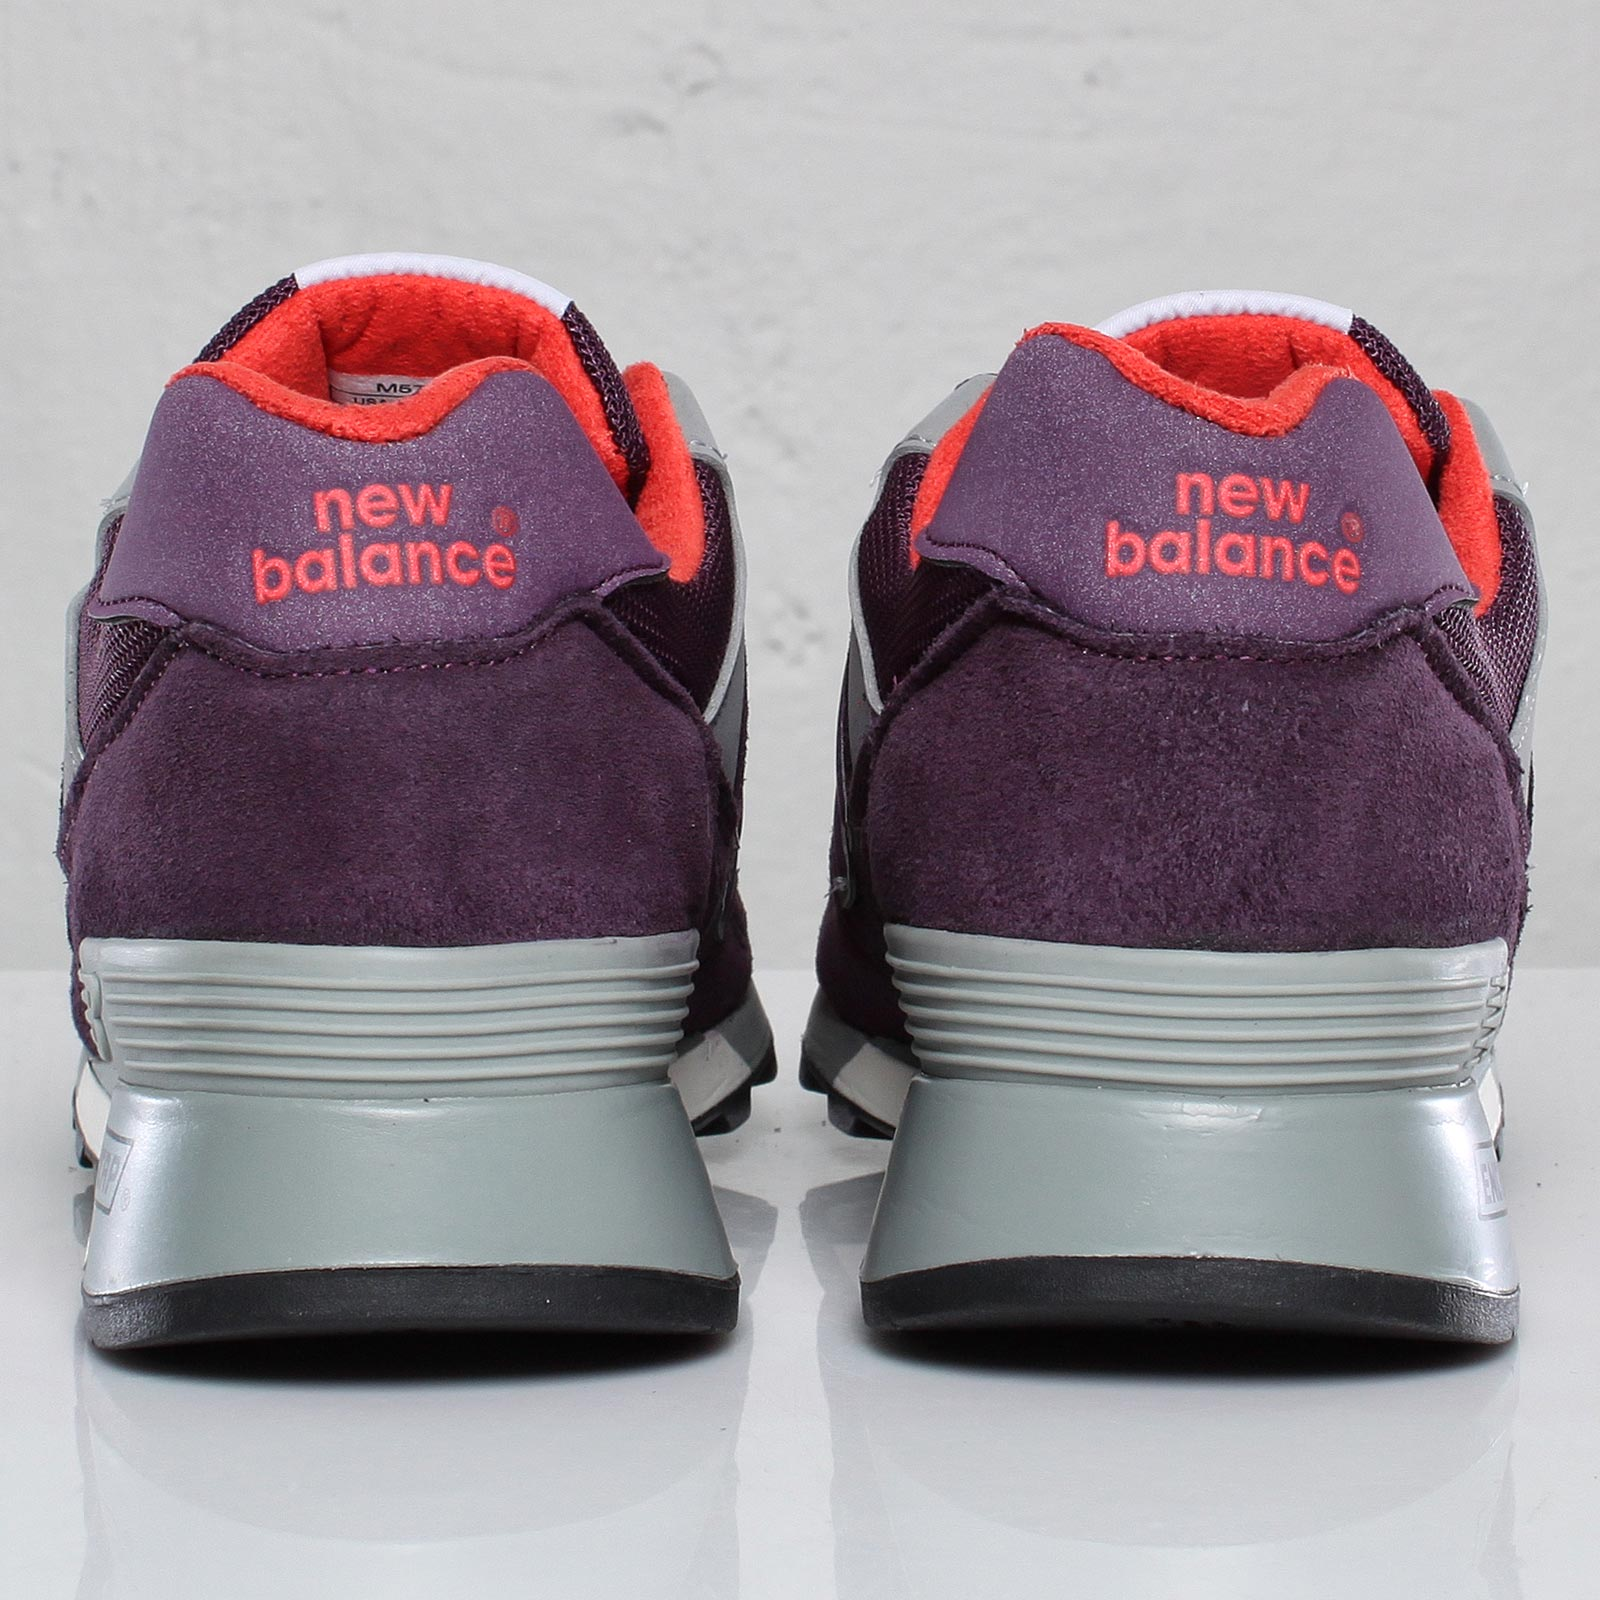 new balance 577 hyprcat ebay